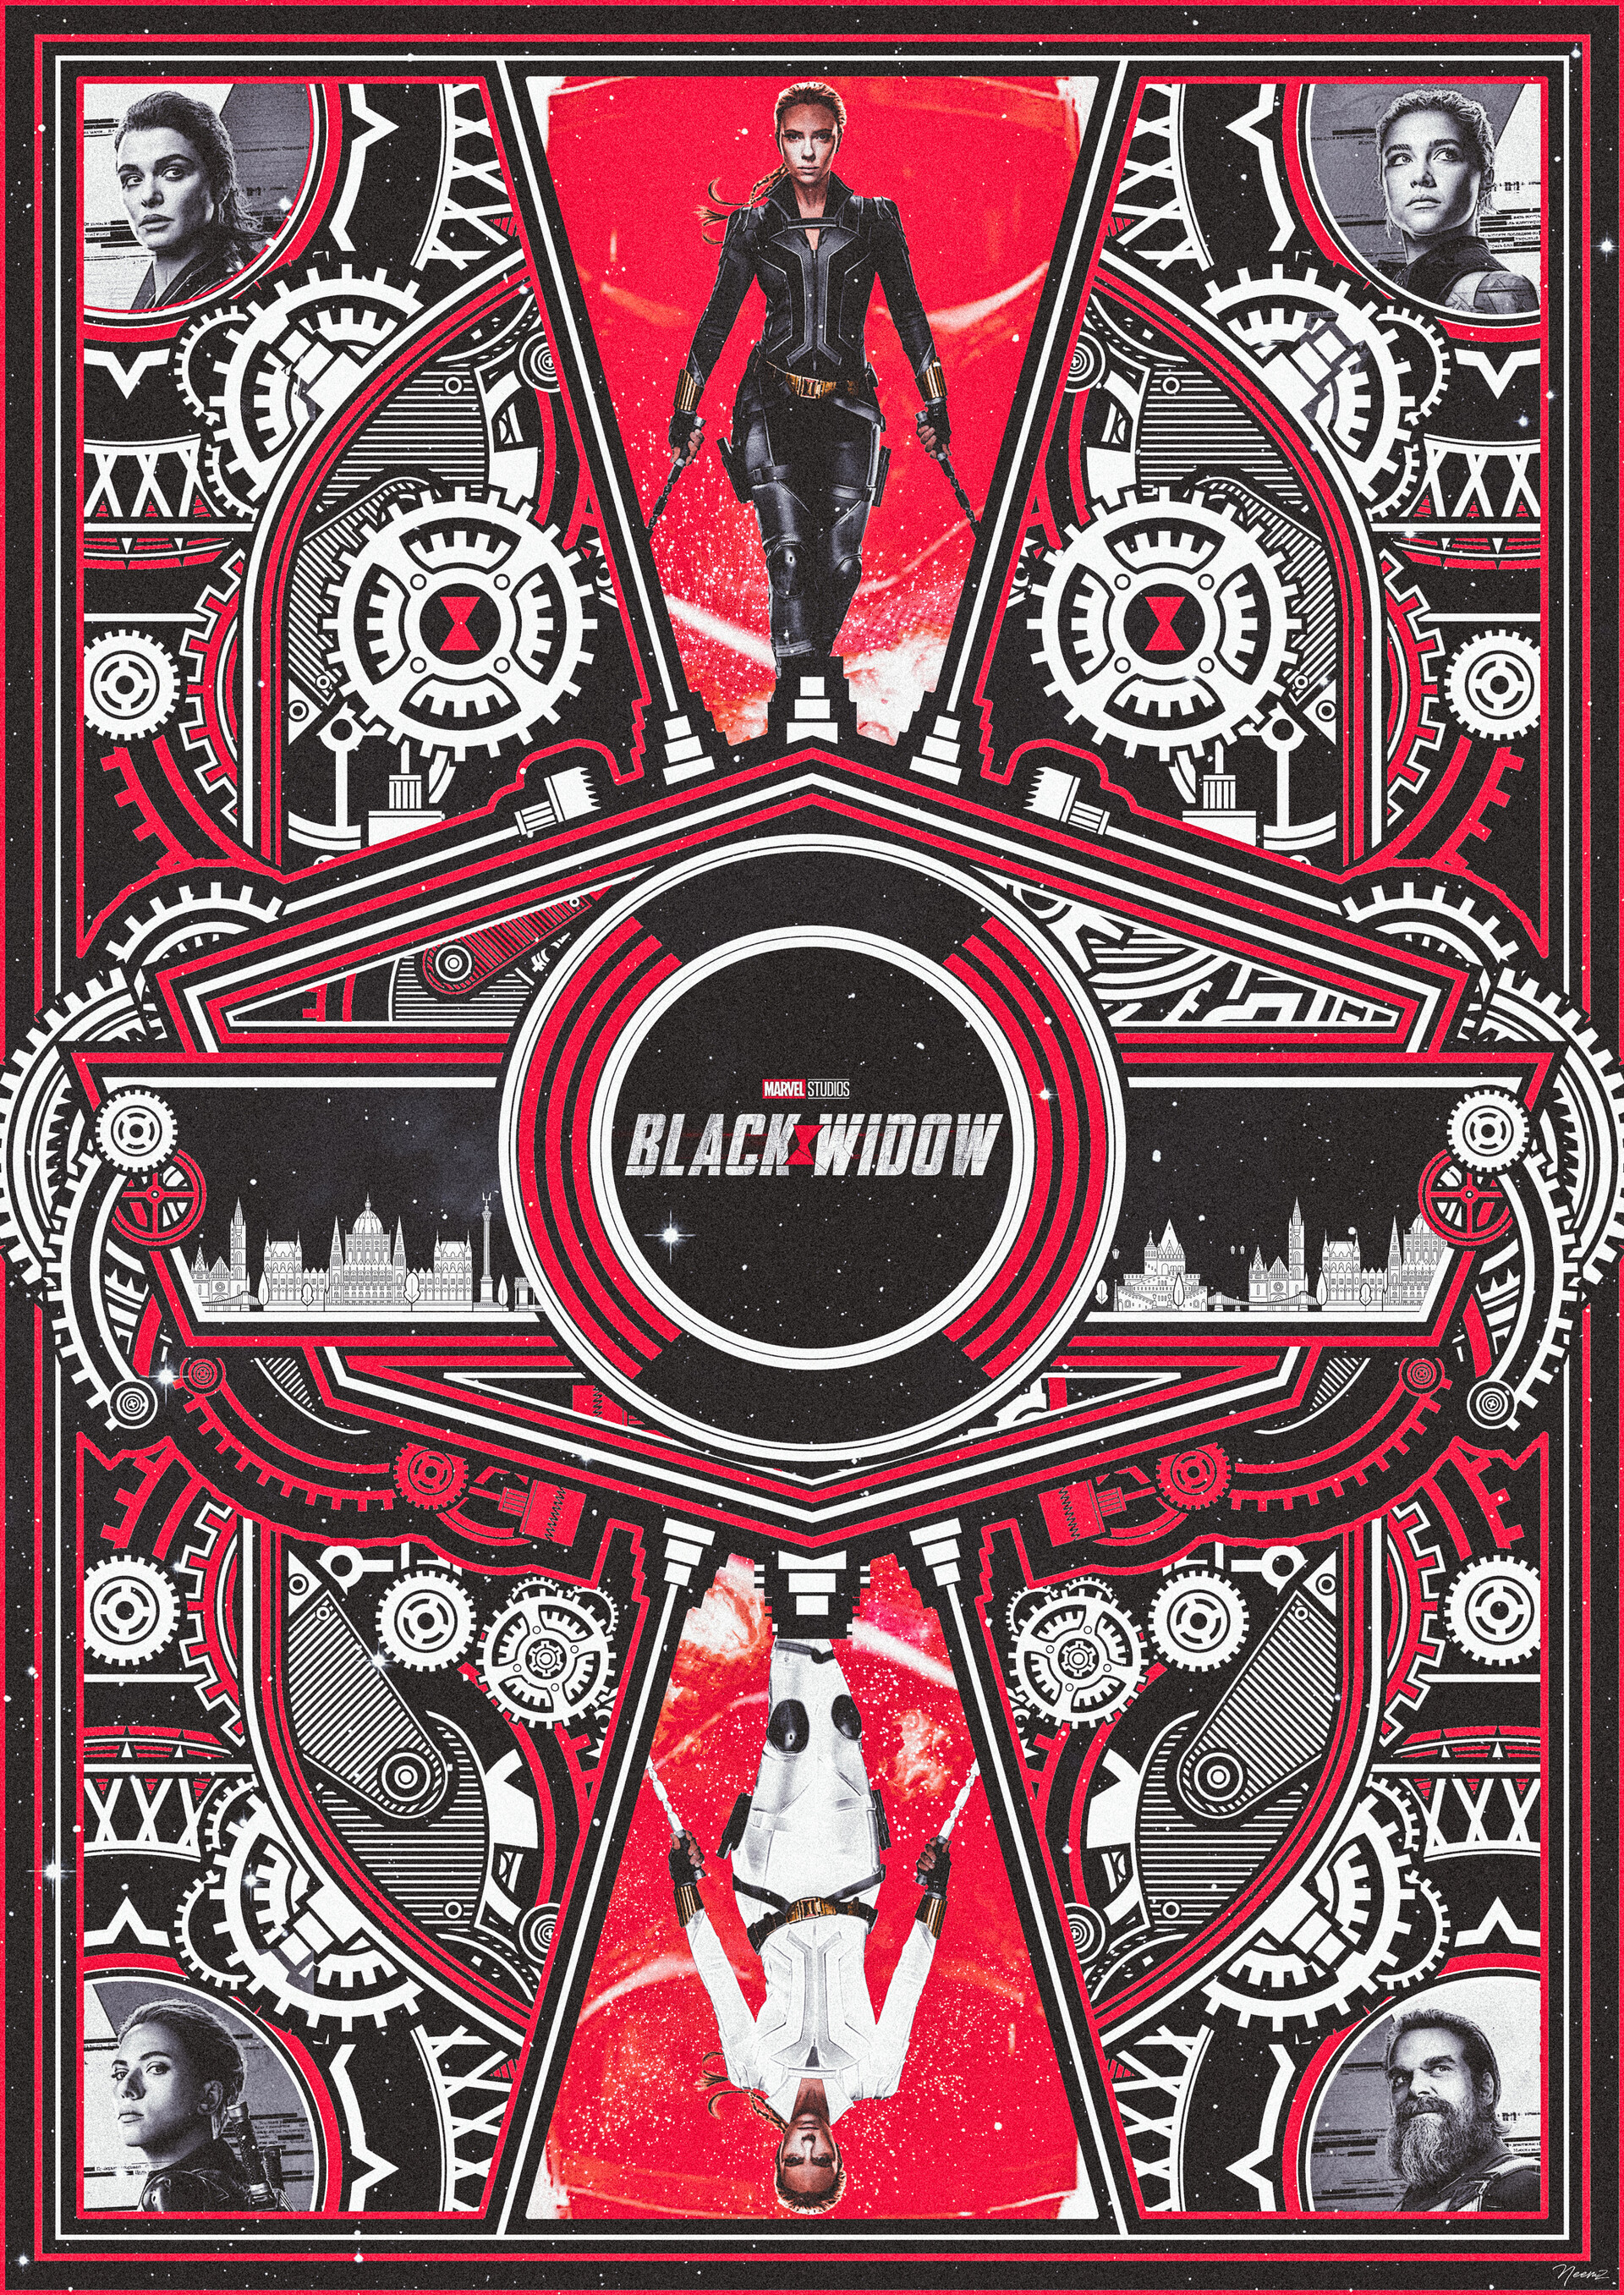 Black Widow Alternative Movie Poster by The Movie Poster Guy, Neemz